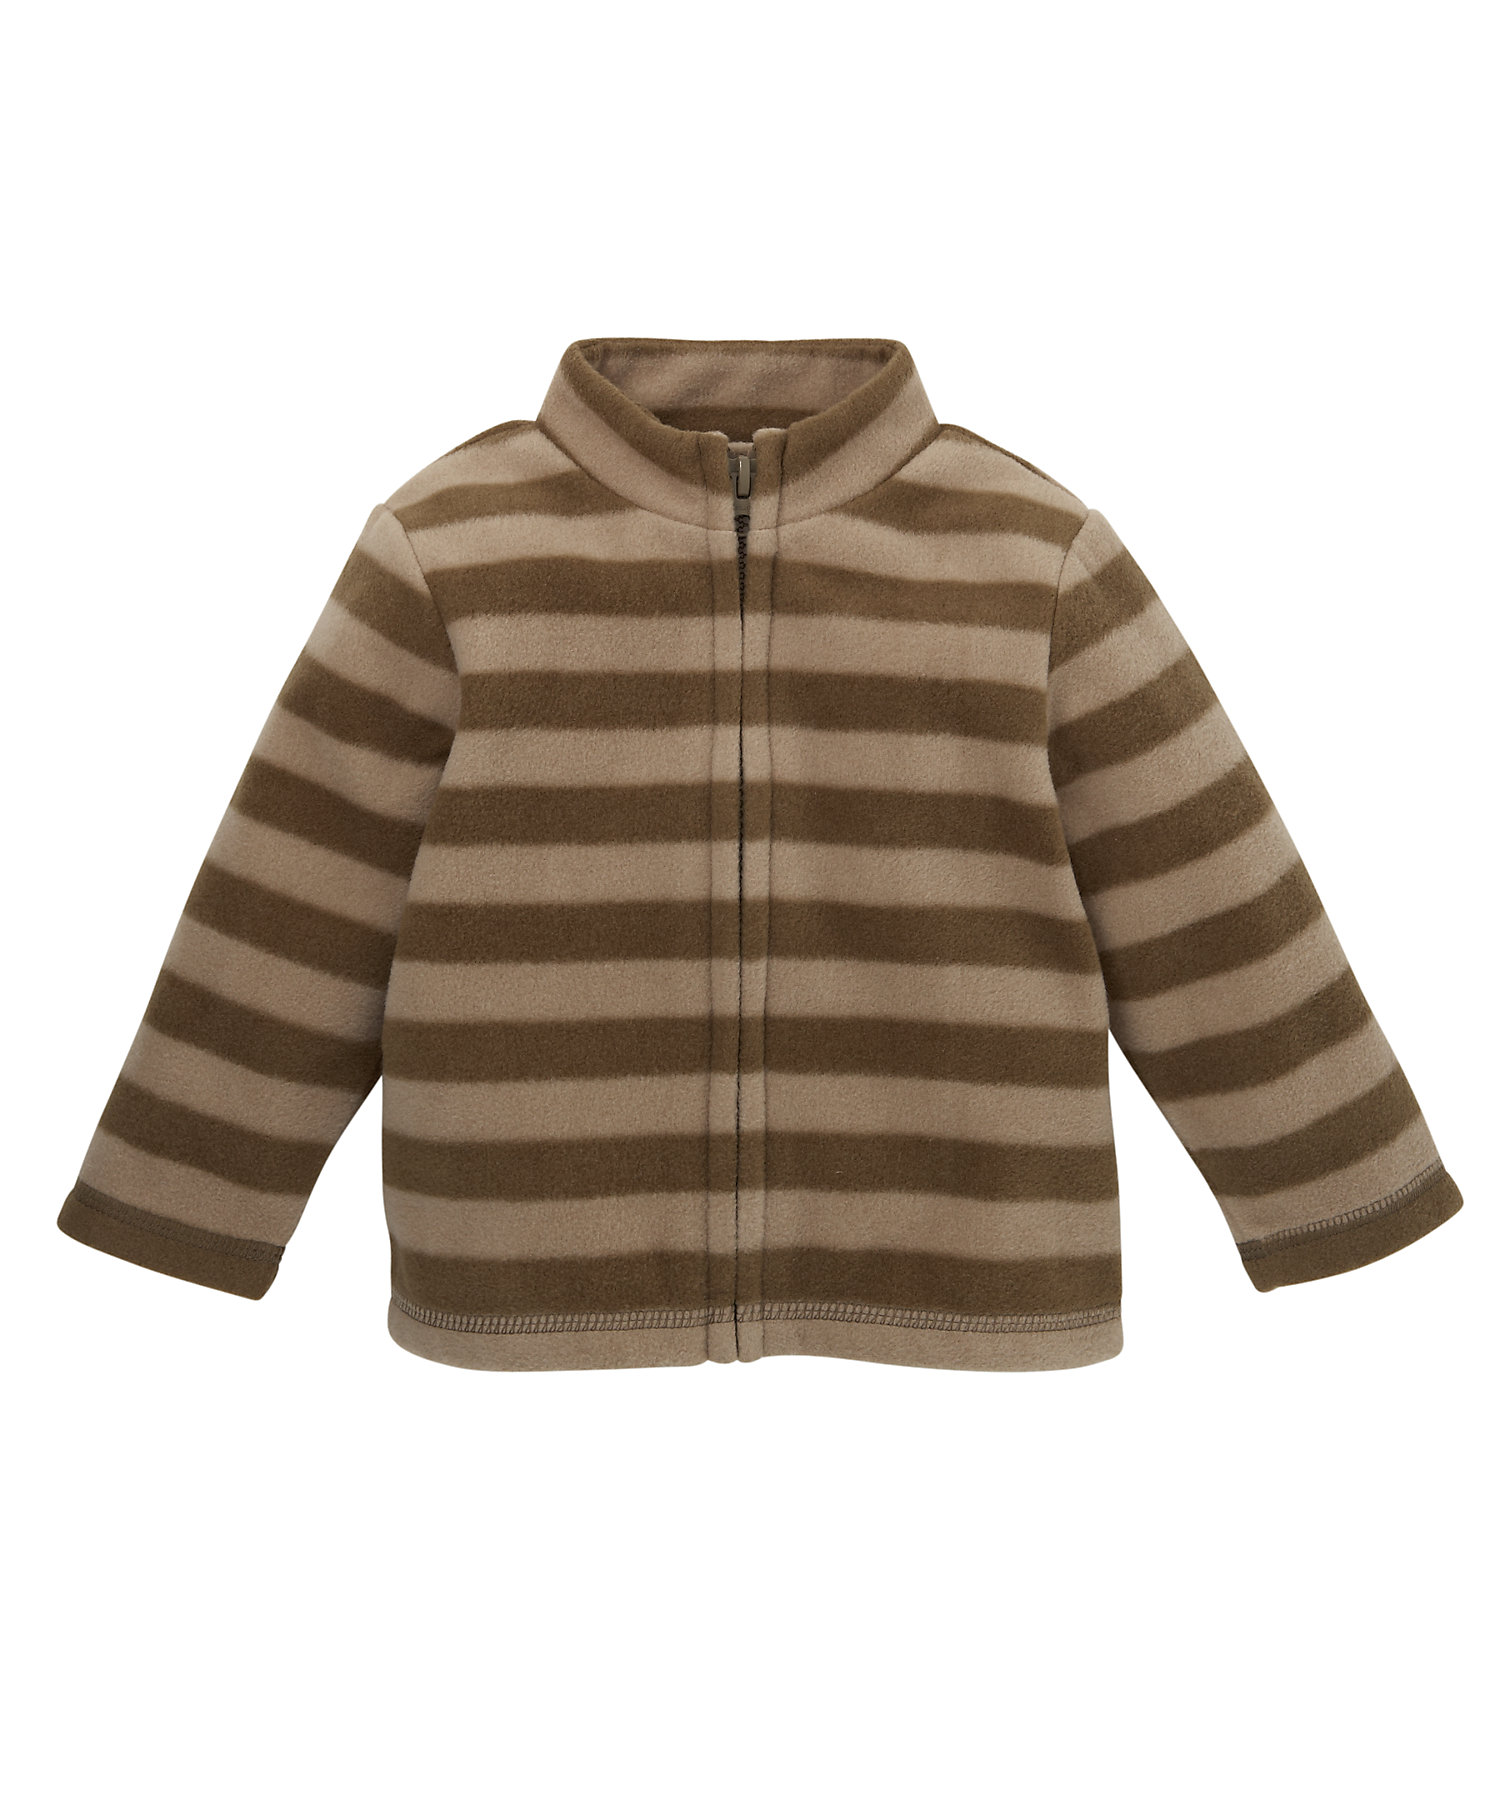 Mothercare   Boys Full Sleeves Sweatshirt Striped - Brown